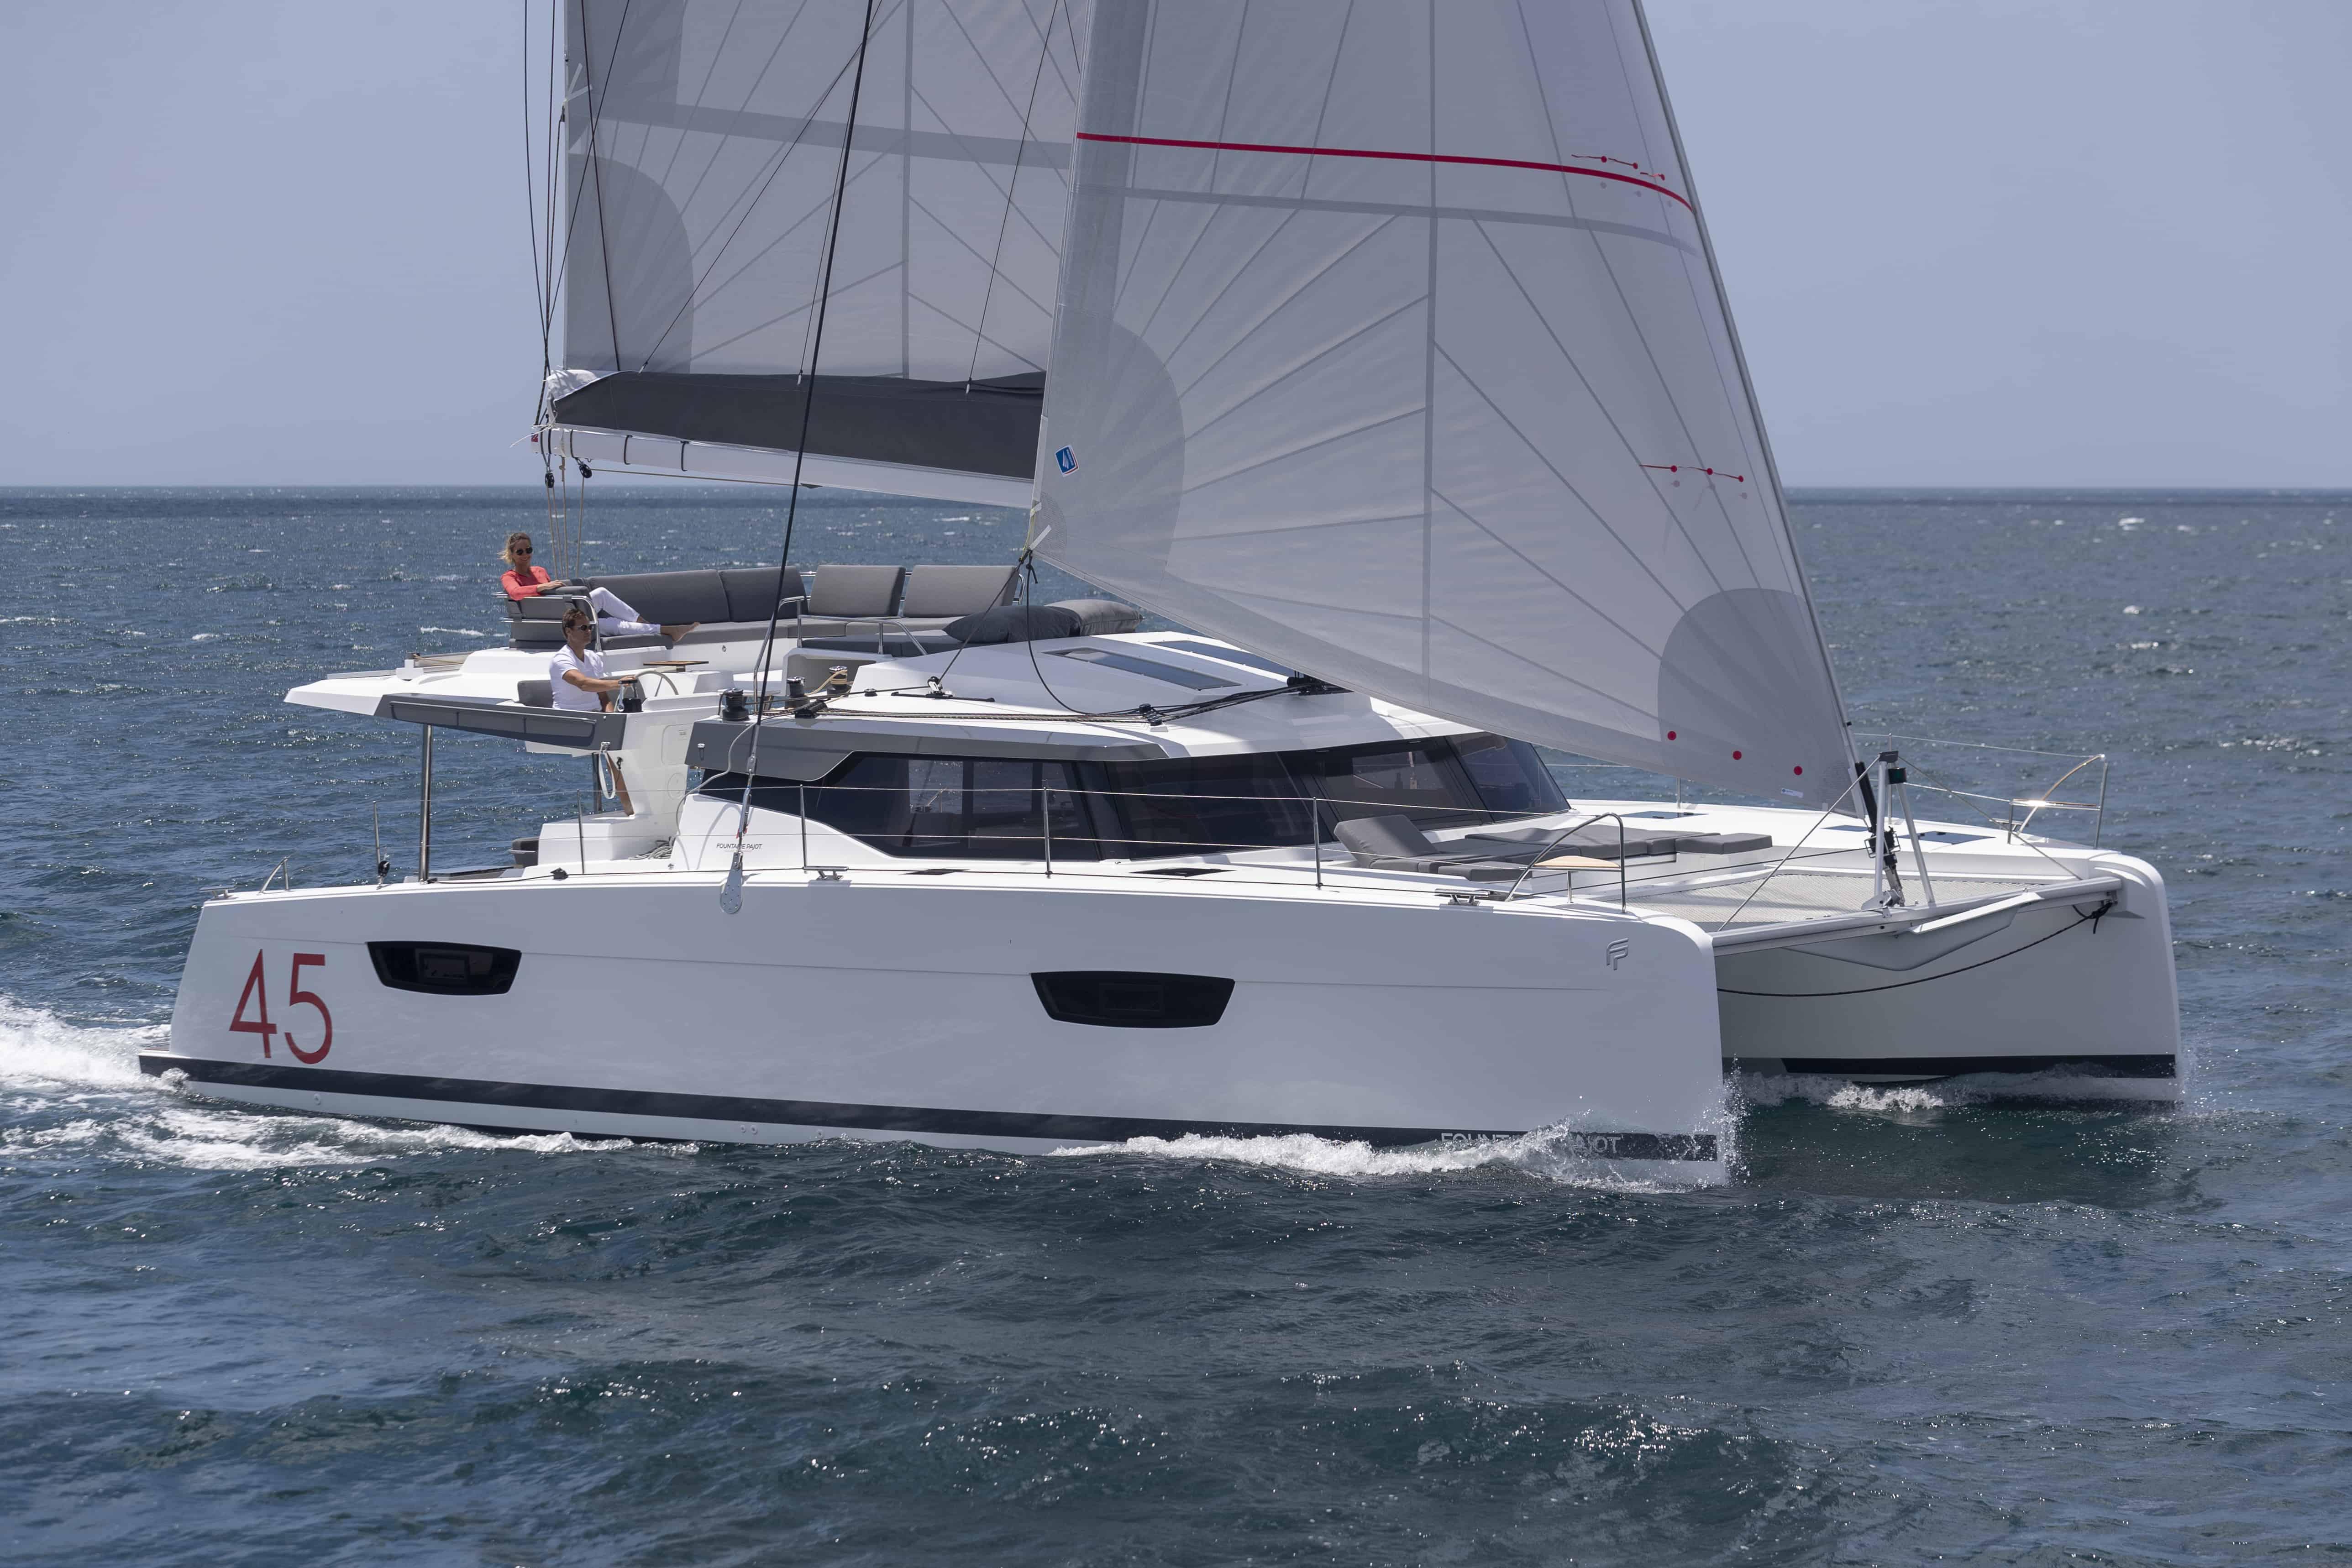 Elba 45 - best charter model